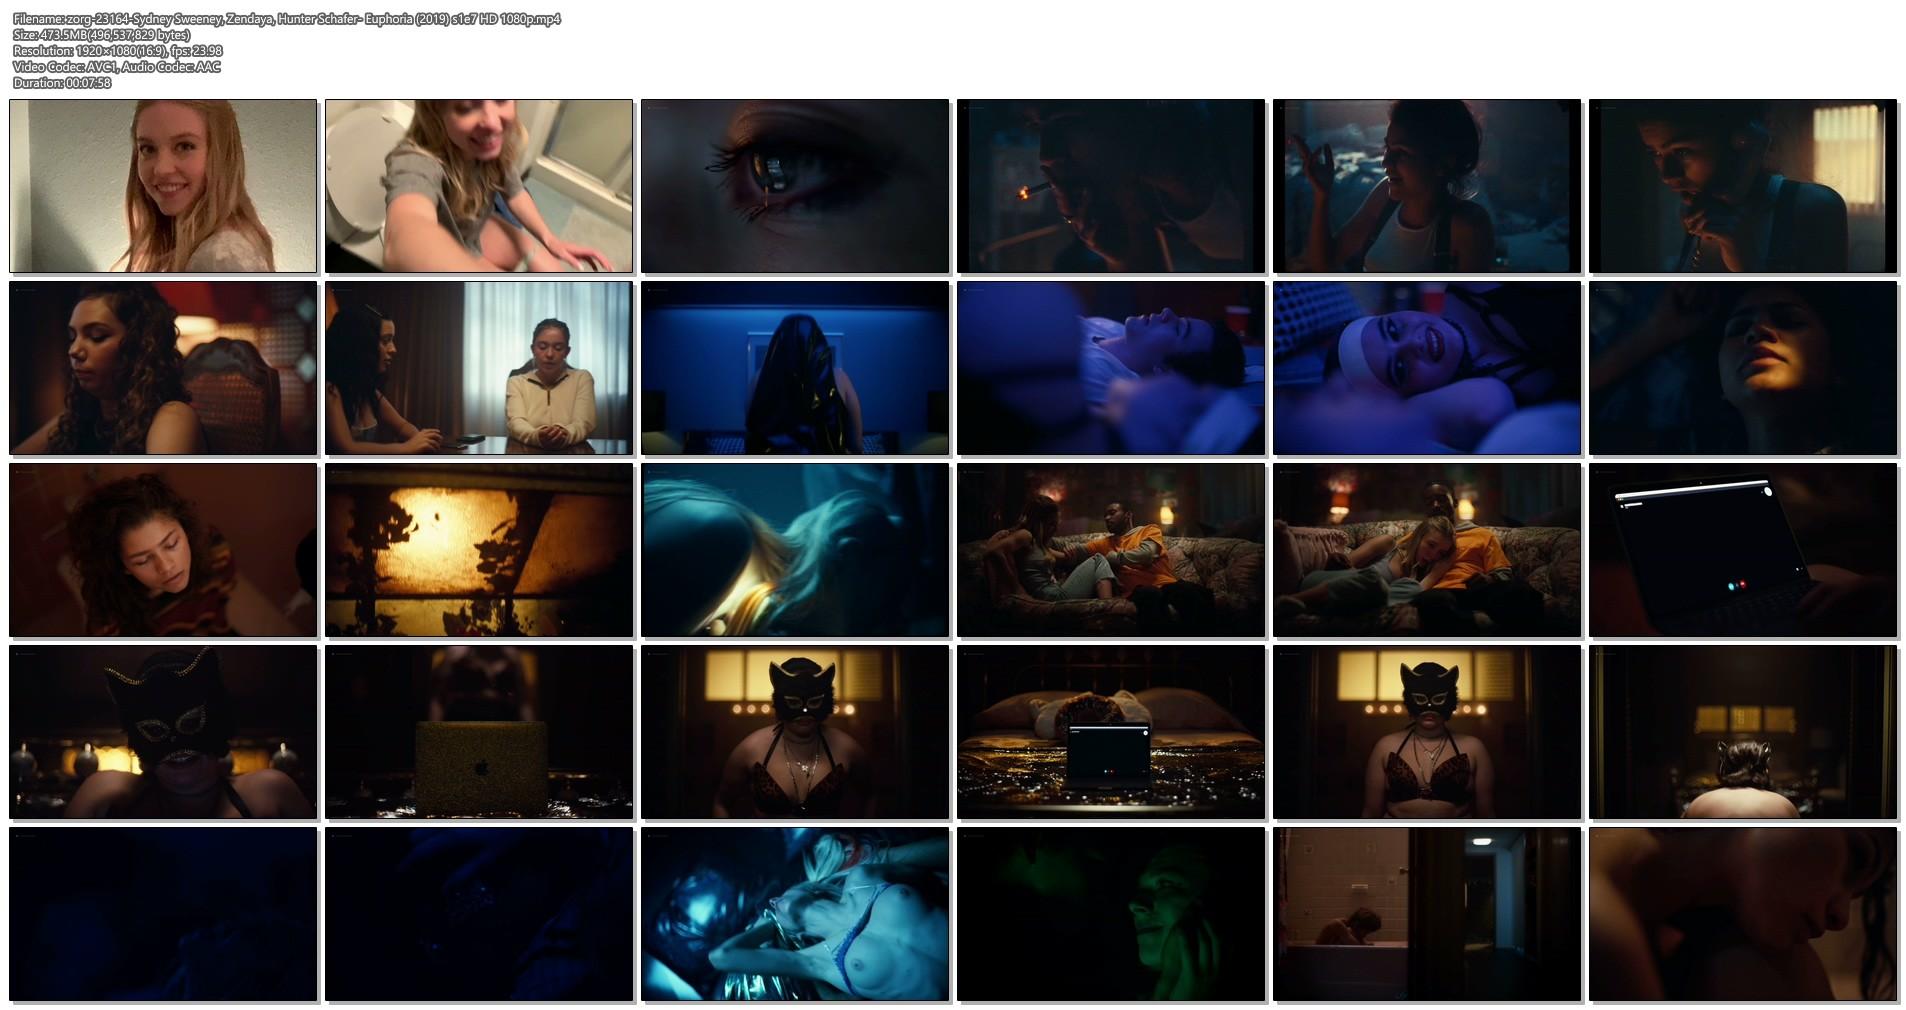 Hunter Schafer nude topless, Sydney Sweeney, Zendaya hot - Euphoria (2019) s1e7 HD 1080p (1)